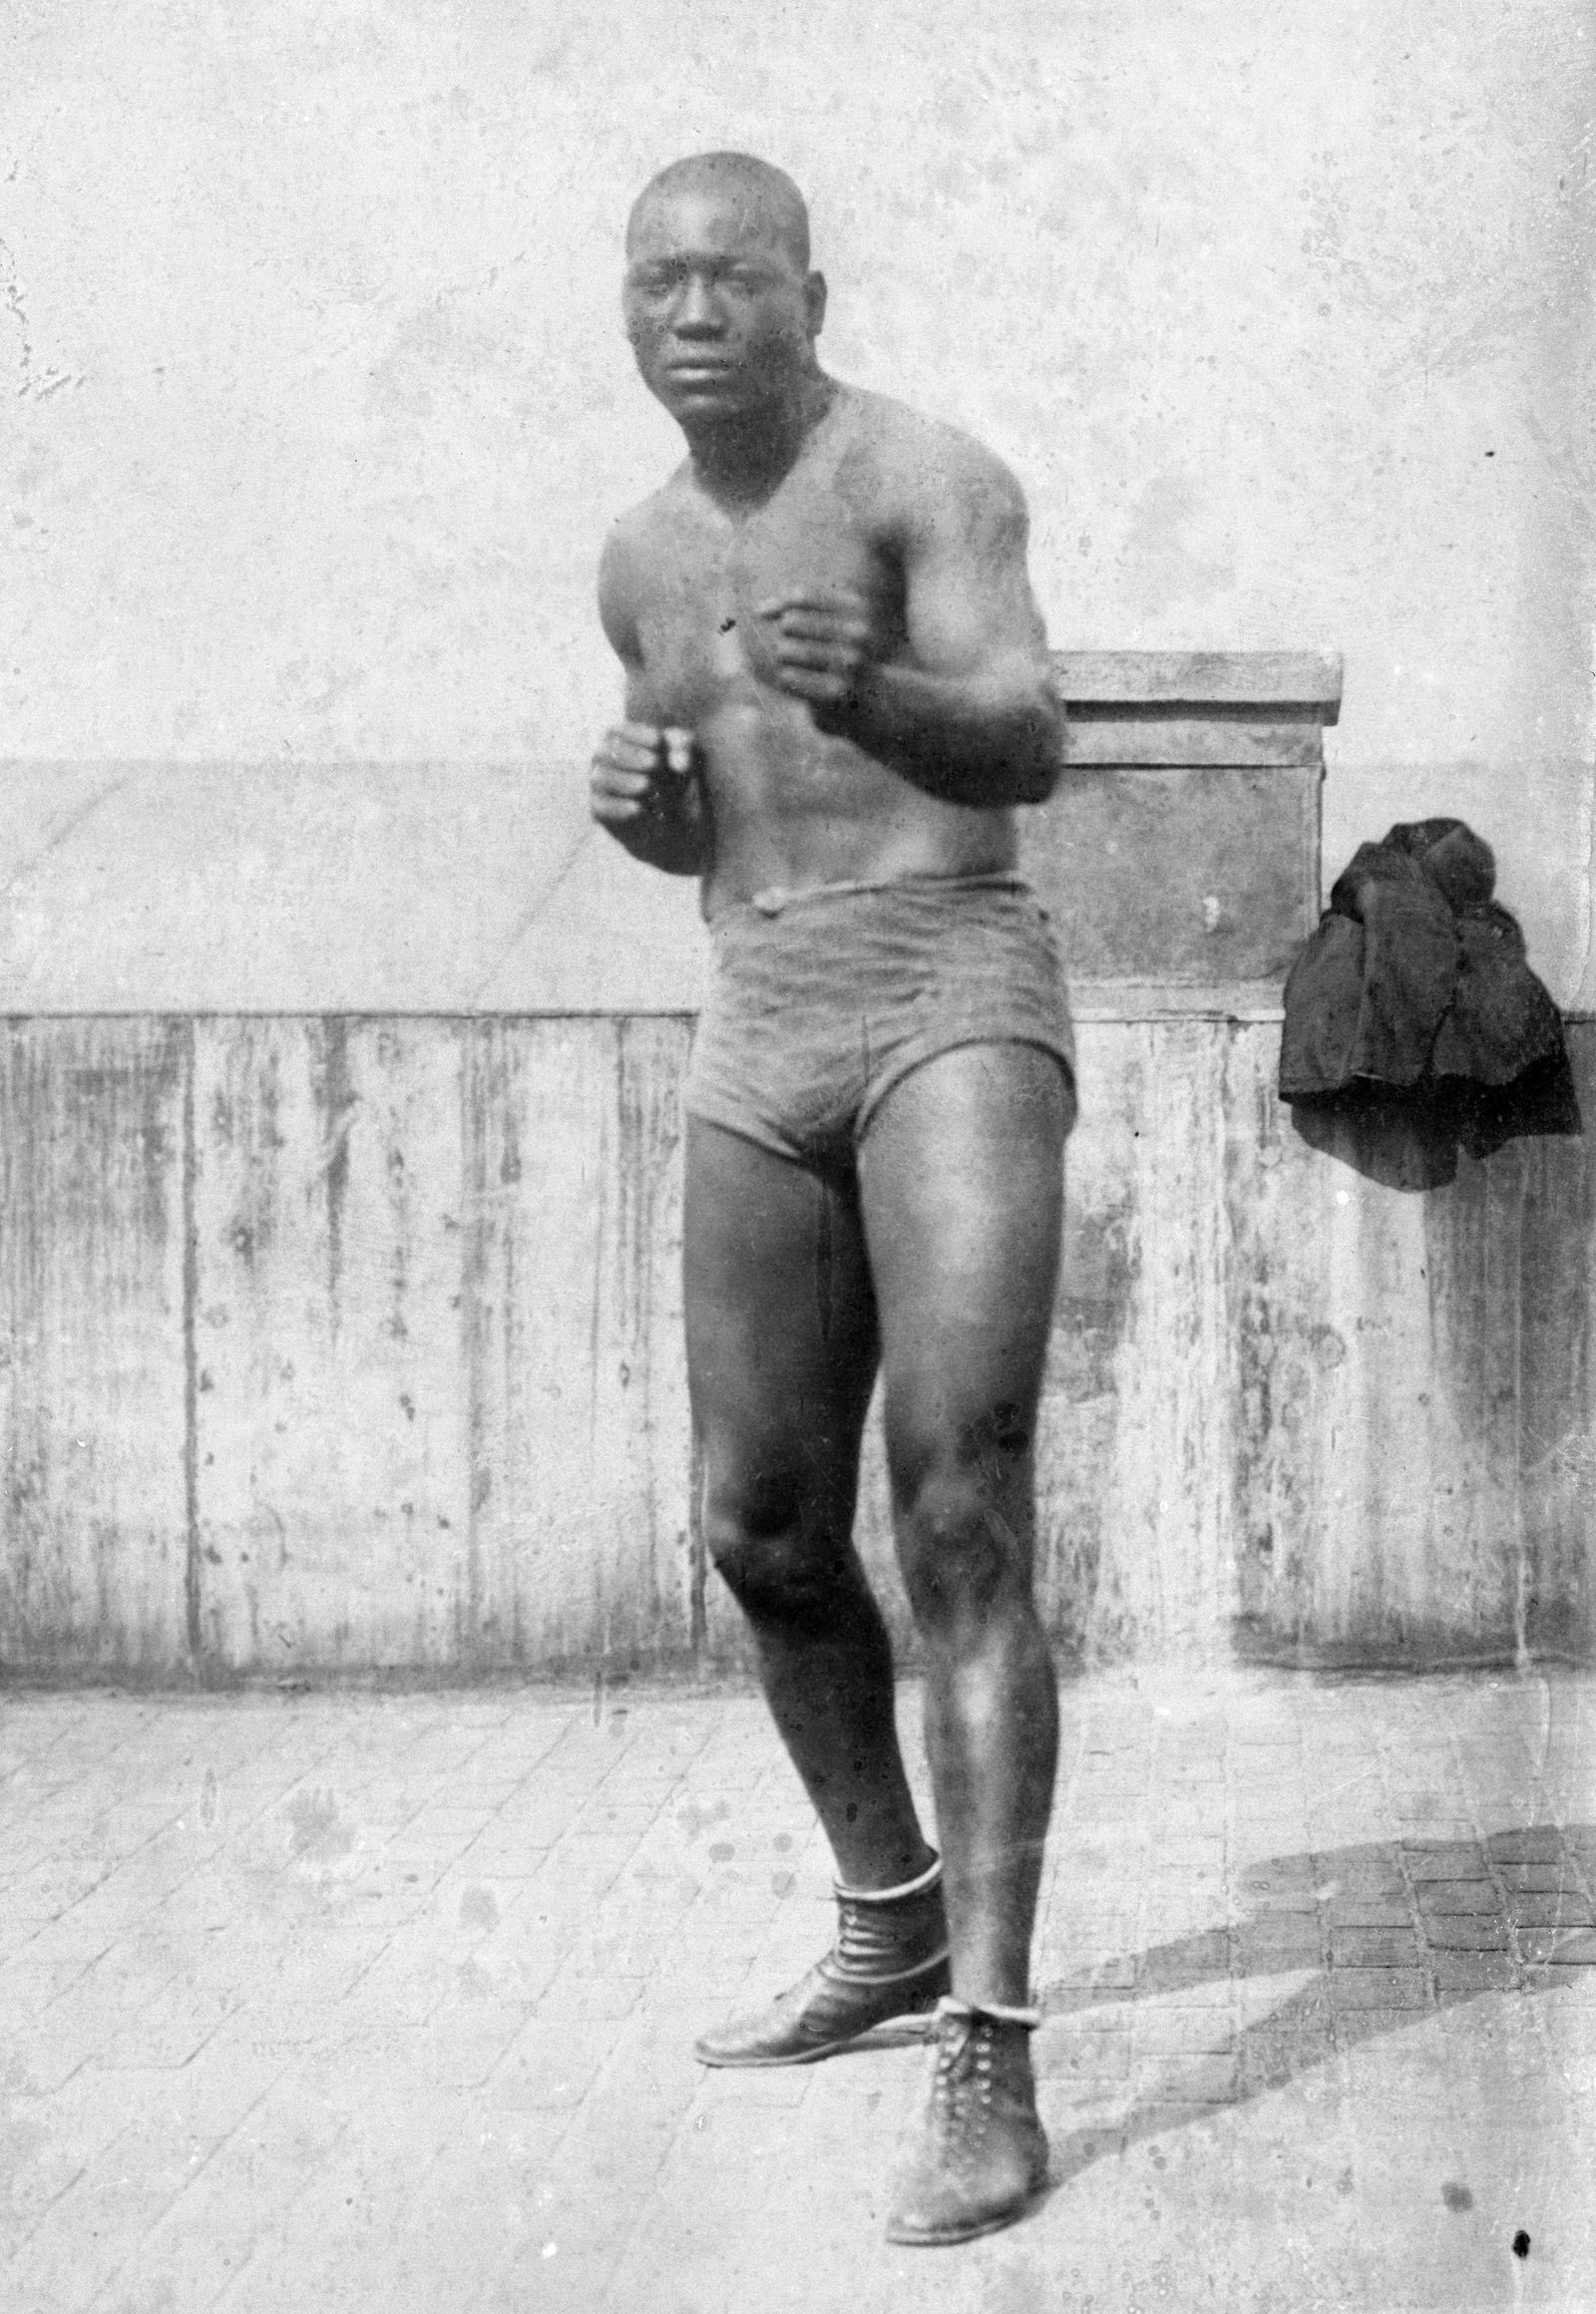 Portrait of Jack Johnson in Fighting Stance